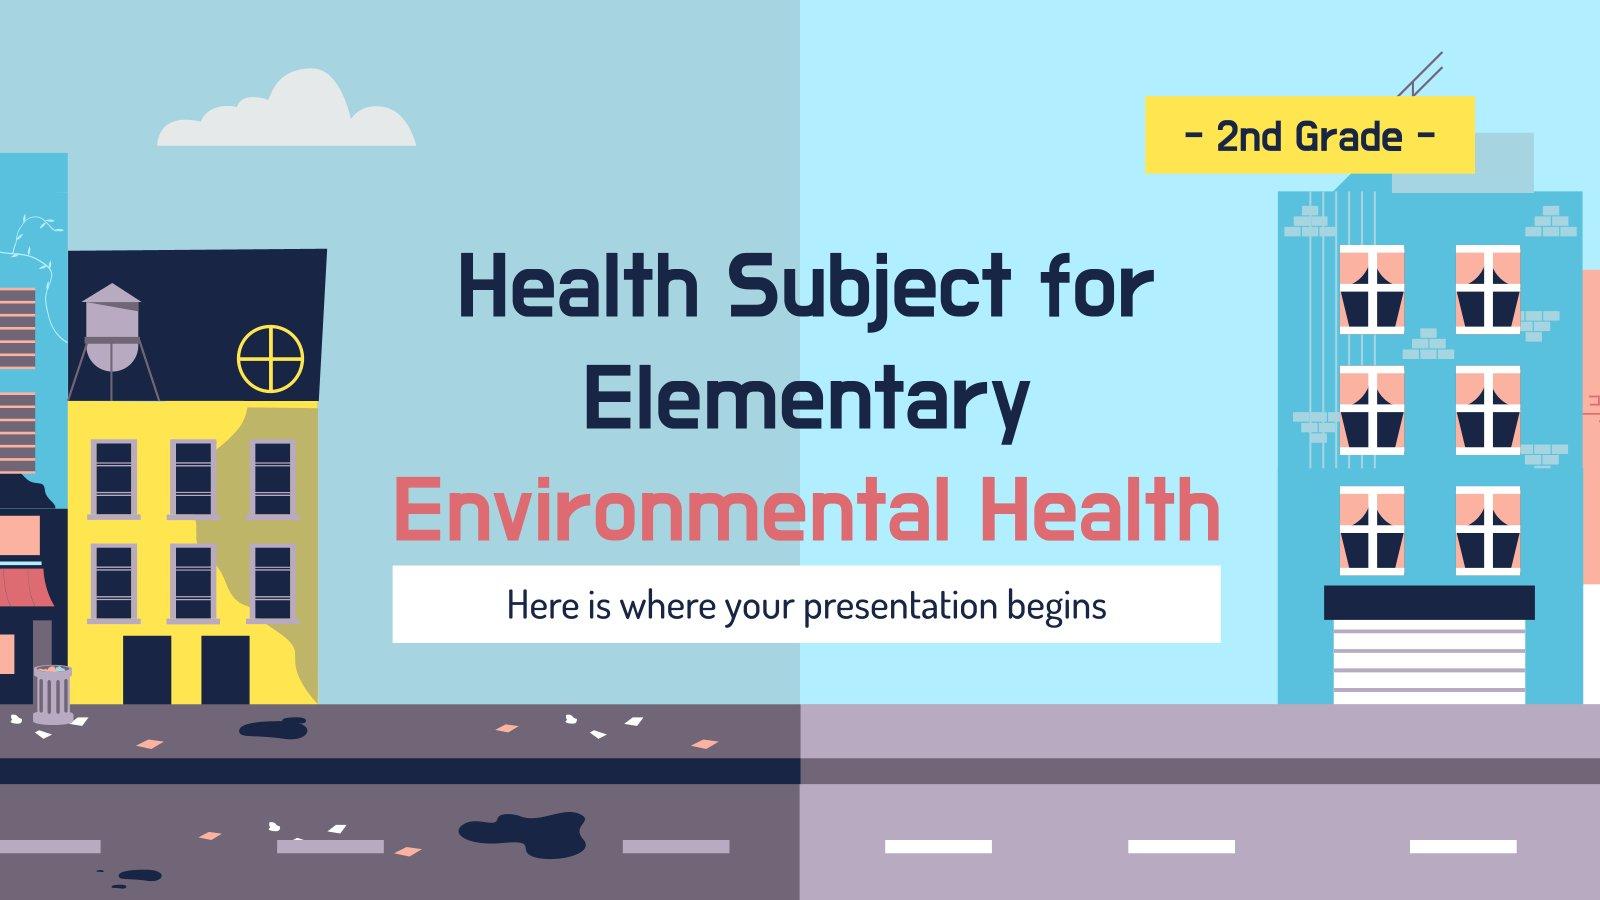 Health Subject for Elementary - 2nd Grade: Environmental Health presentation template